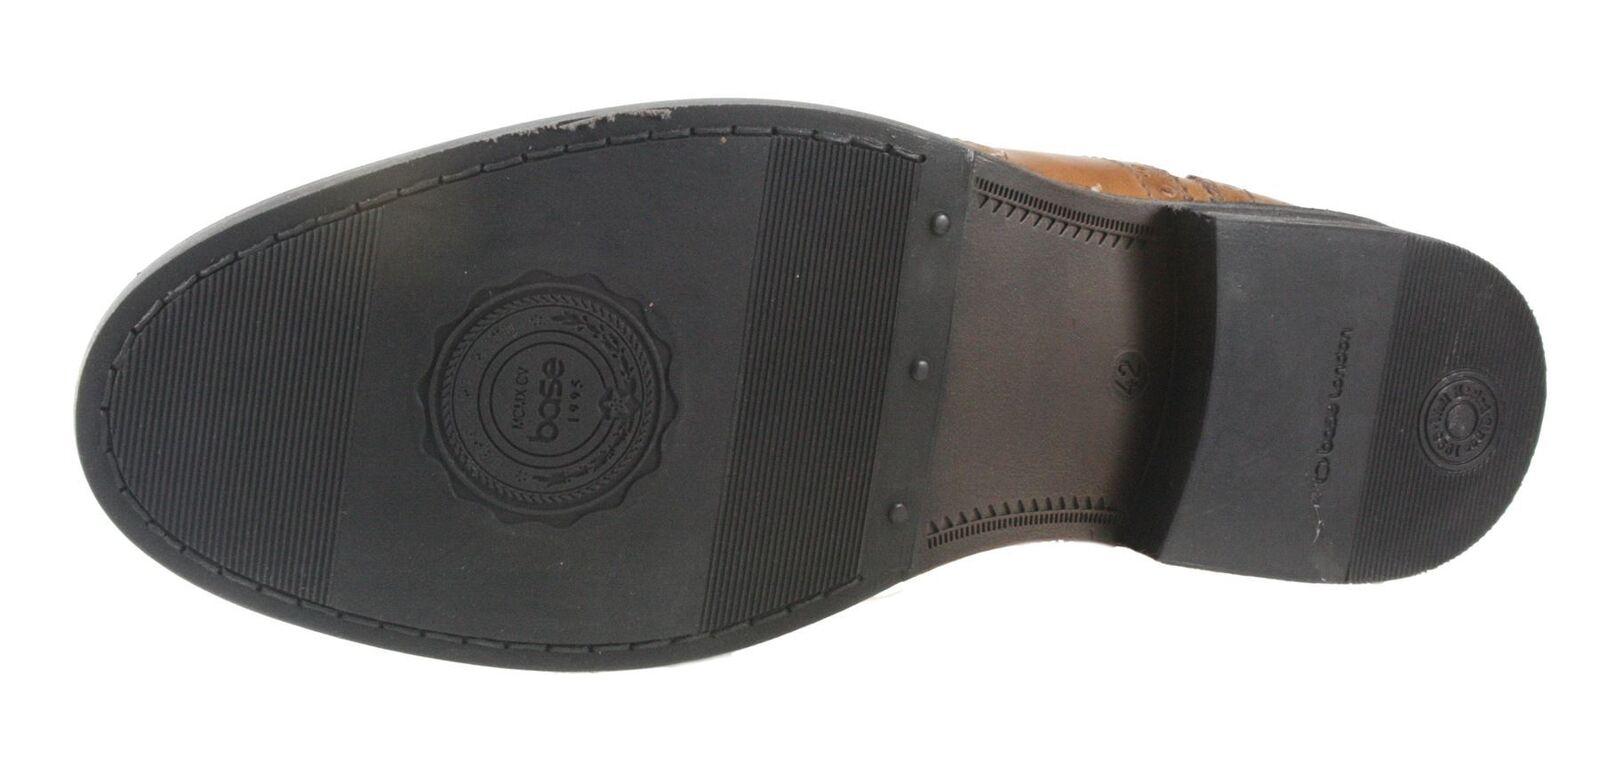 Base london hellbraun schwarz Halbschuhe zum Schnüren Leder Leder Leder Herren 31a2f6